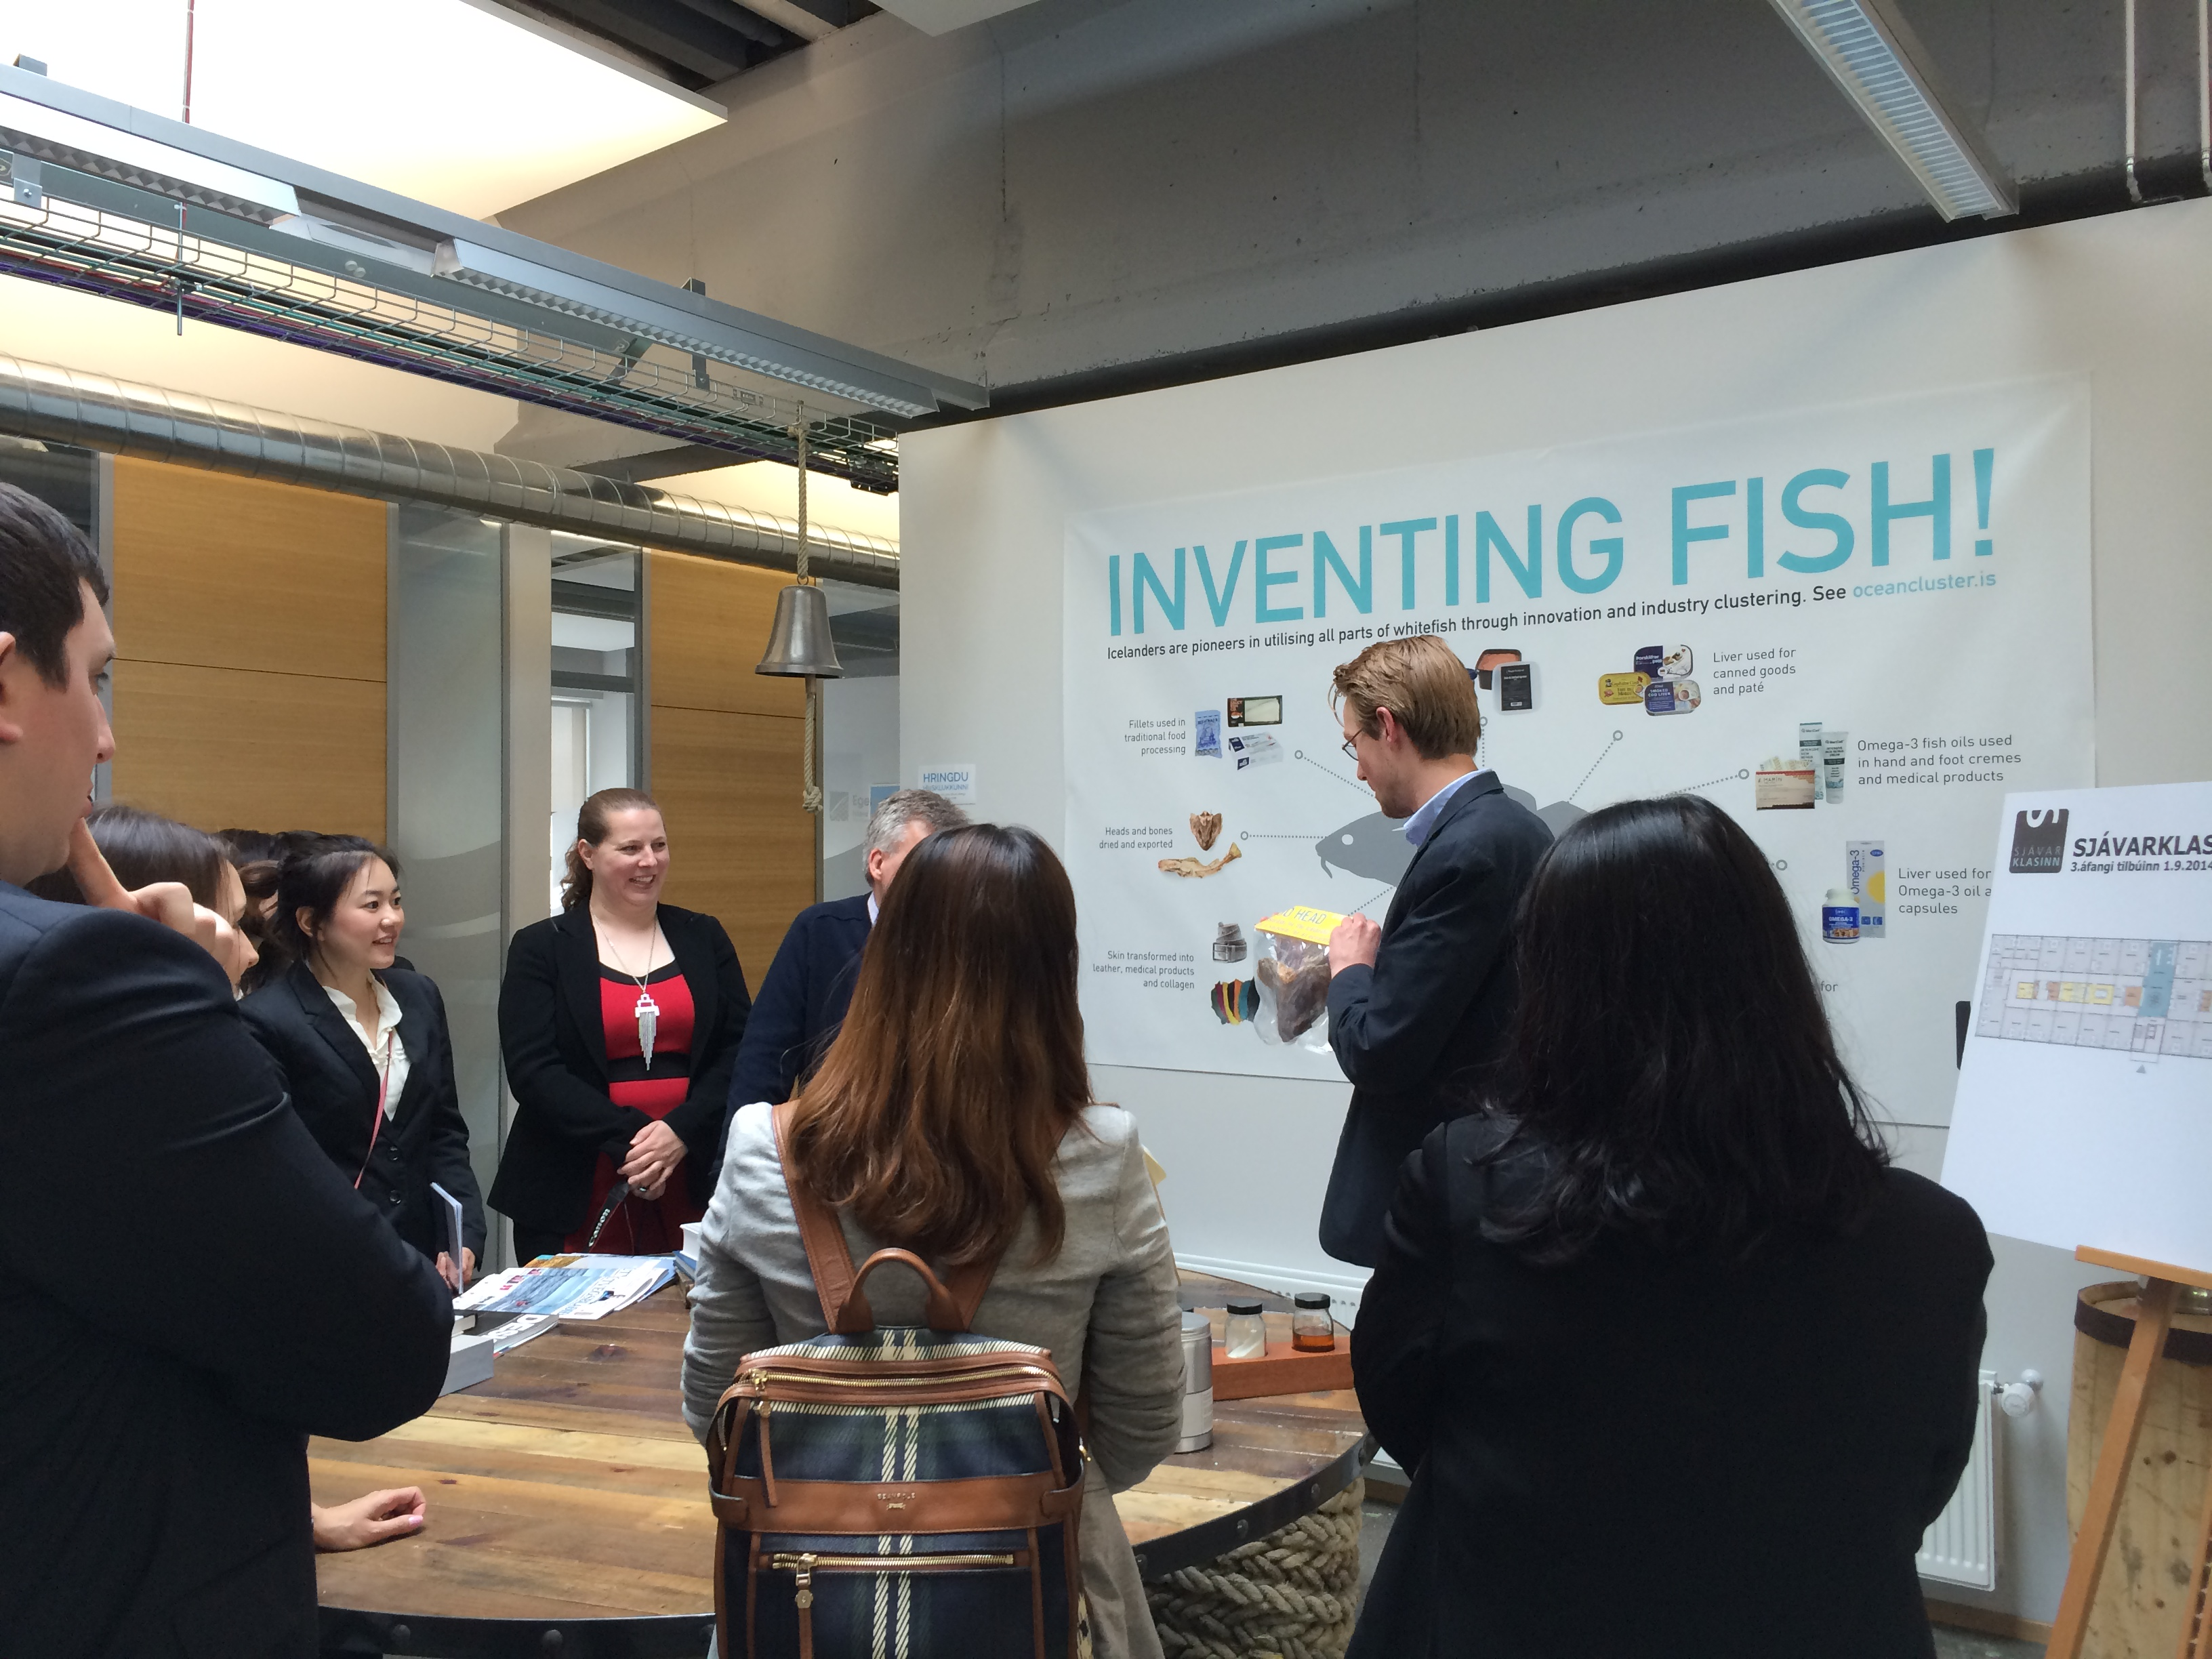 MBA students from Edinburgh University visit the Ocean Cluster House